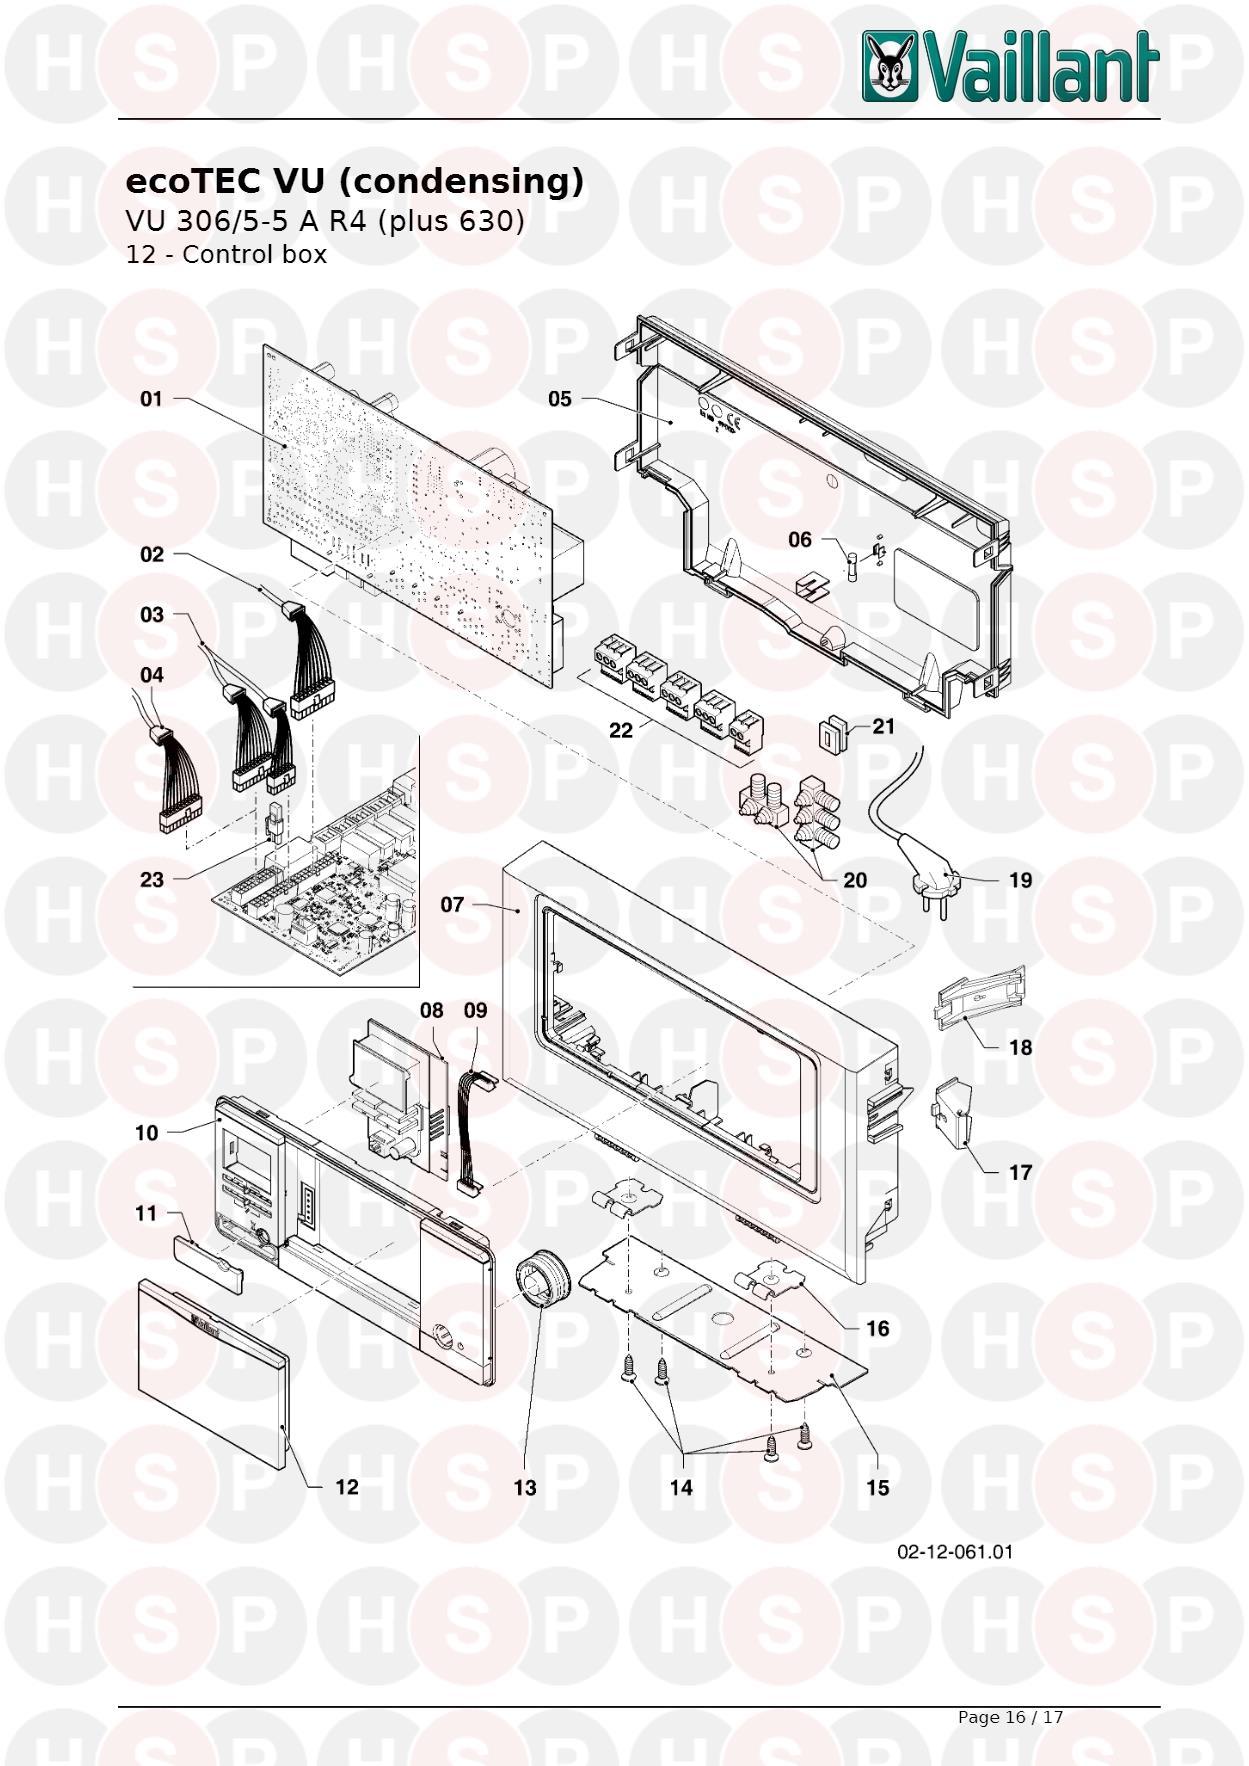 Vaillant ecotec plus 831 wiring diagram best wiring diagram 2018 wiring diagram for vaillant ecotec plus 831 best asfbconference2016 Images